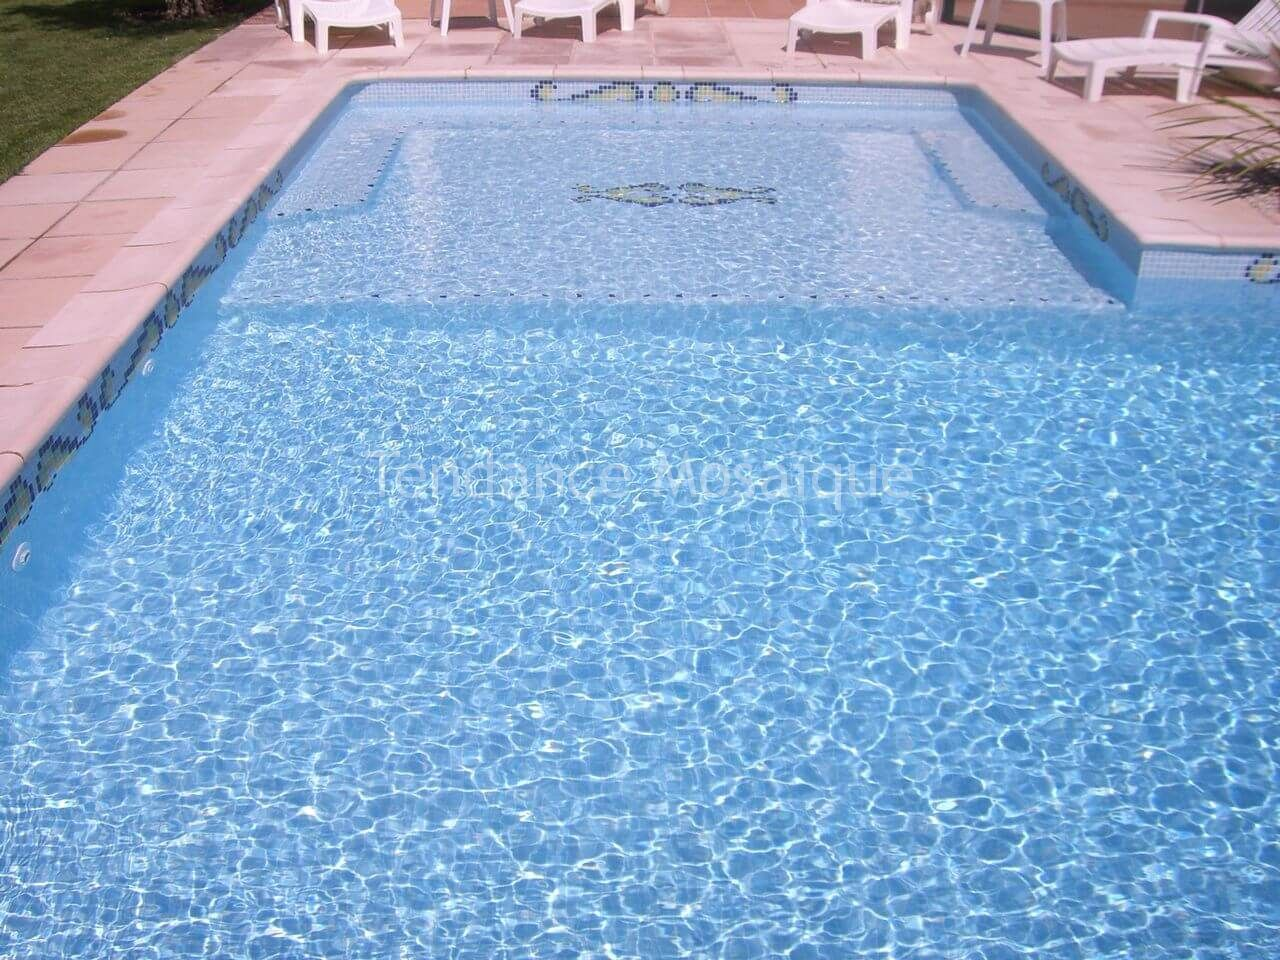 emaux de verre ezarri 2521b pour piscine carrelage piscine. Black Bedroom Furniture Sets. Home Design Ideas